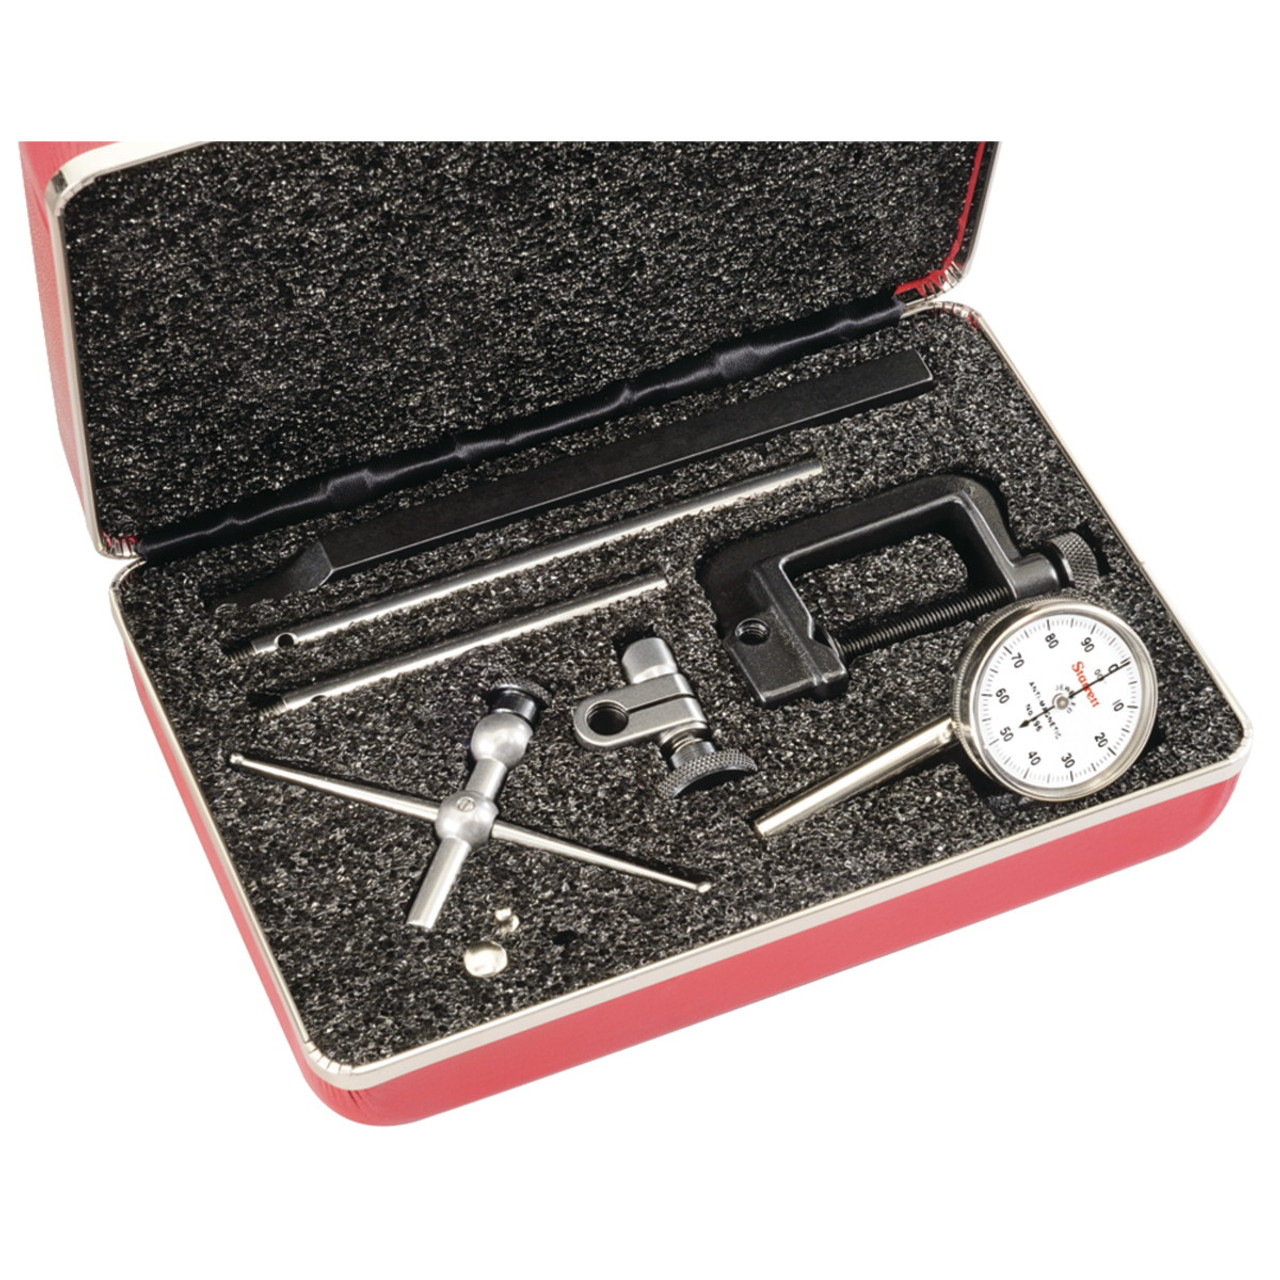 196a6z edp 50701 dial test indicator set 0 100 antimagnetic mercado regal [ 1200 x 1200 Pixel ]